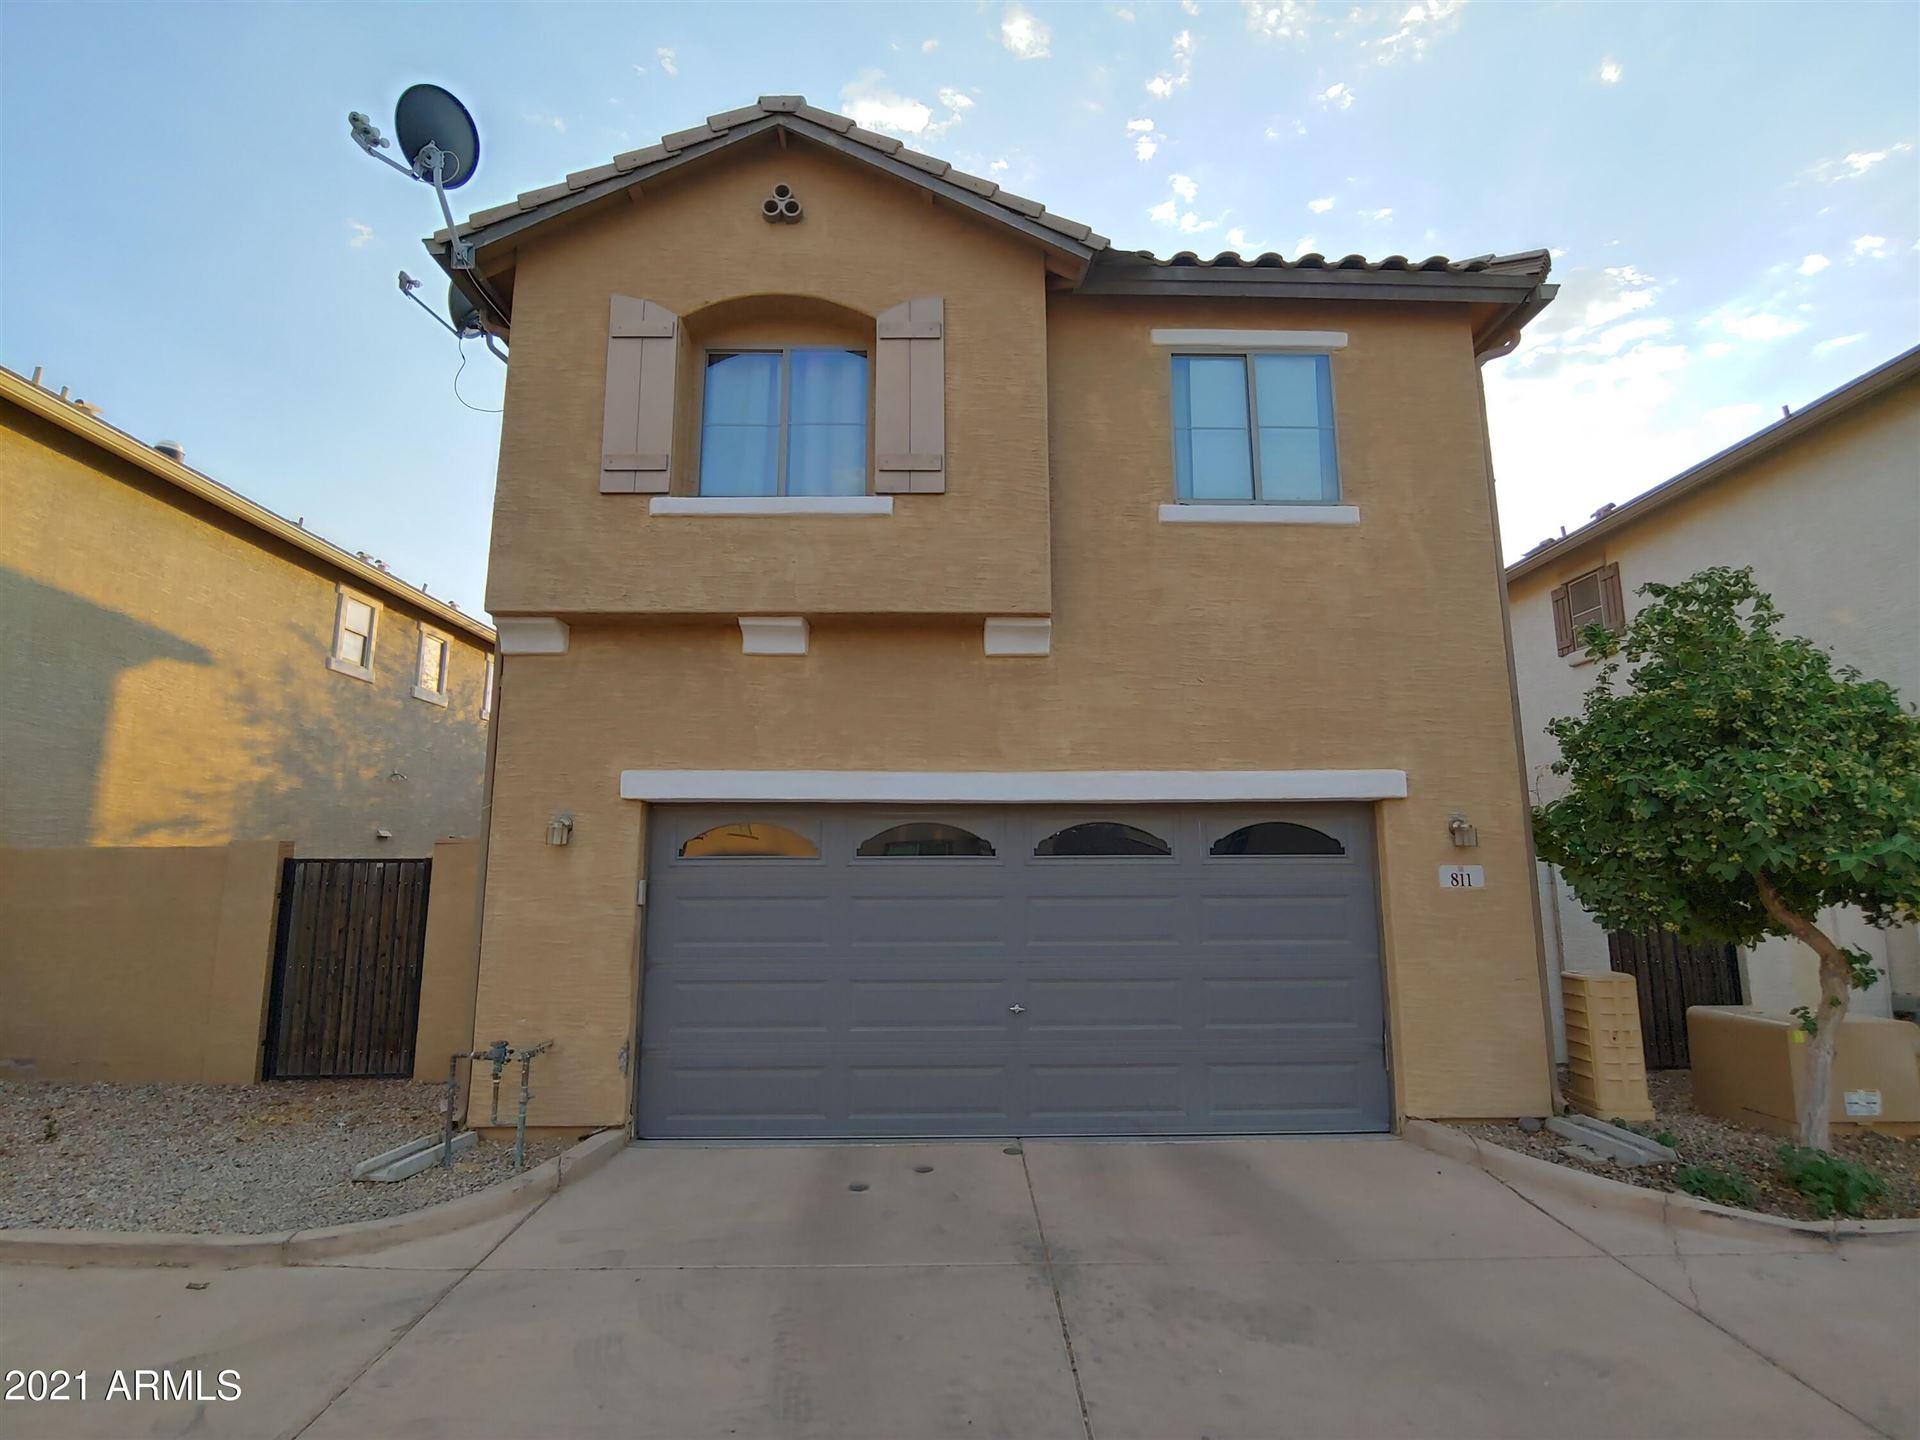 Photo of 811 E Agua Fria Lane, Avondale, AZ 85323 (MLS # 6265600)